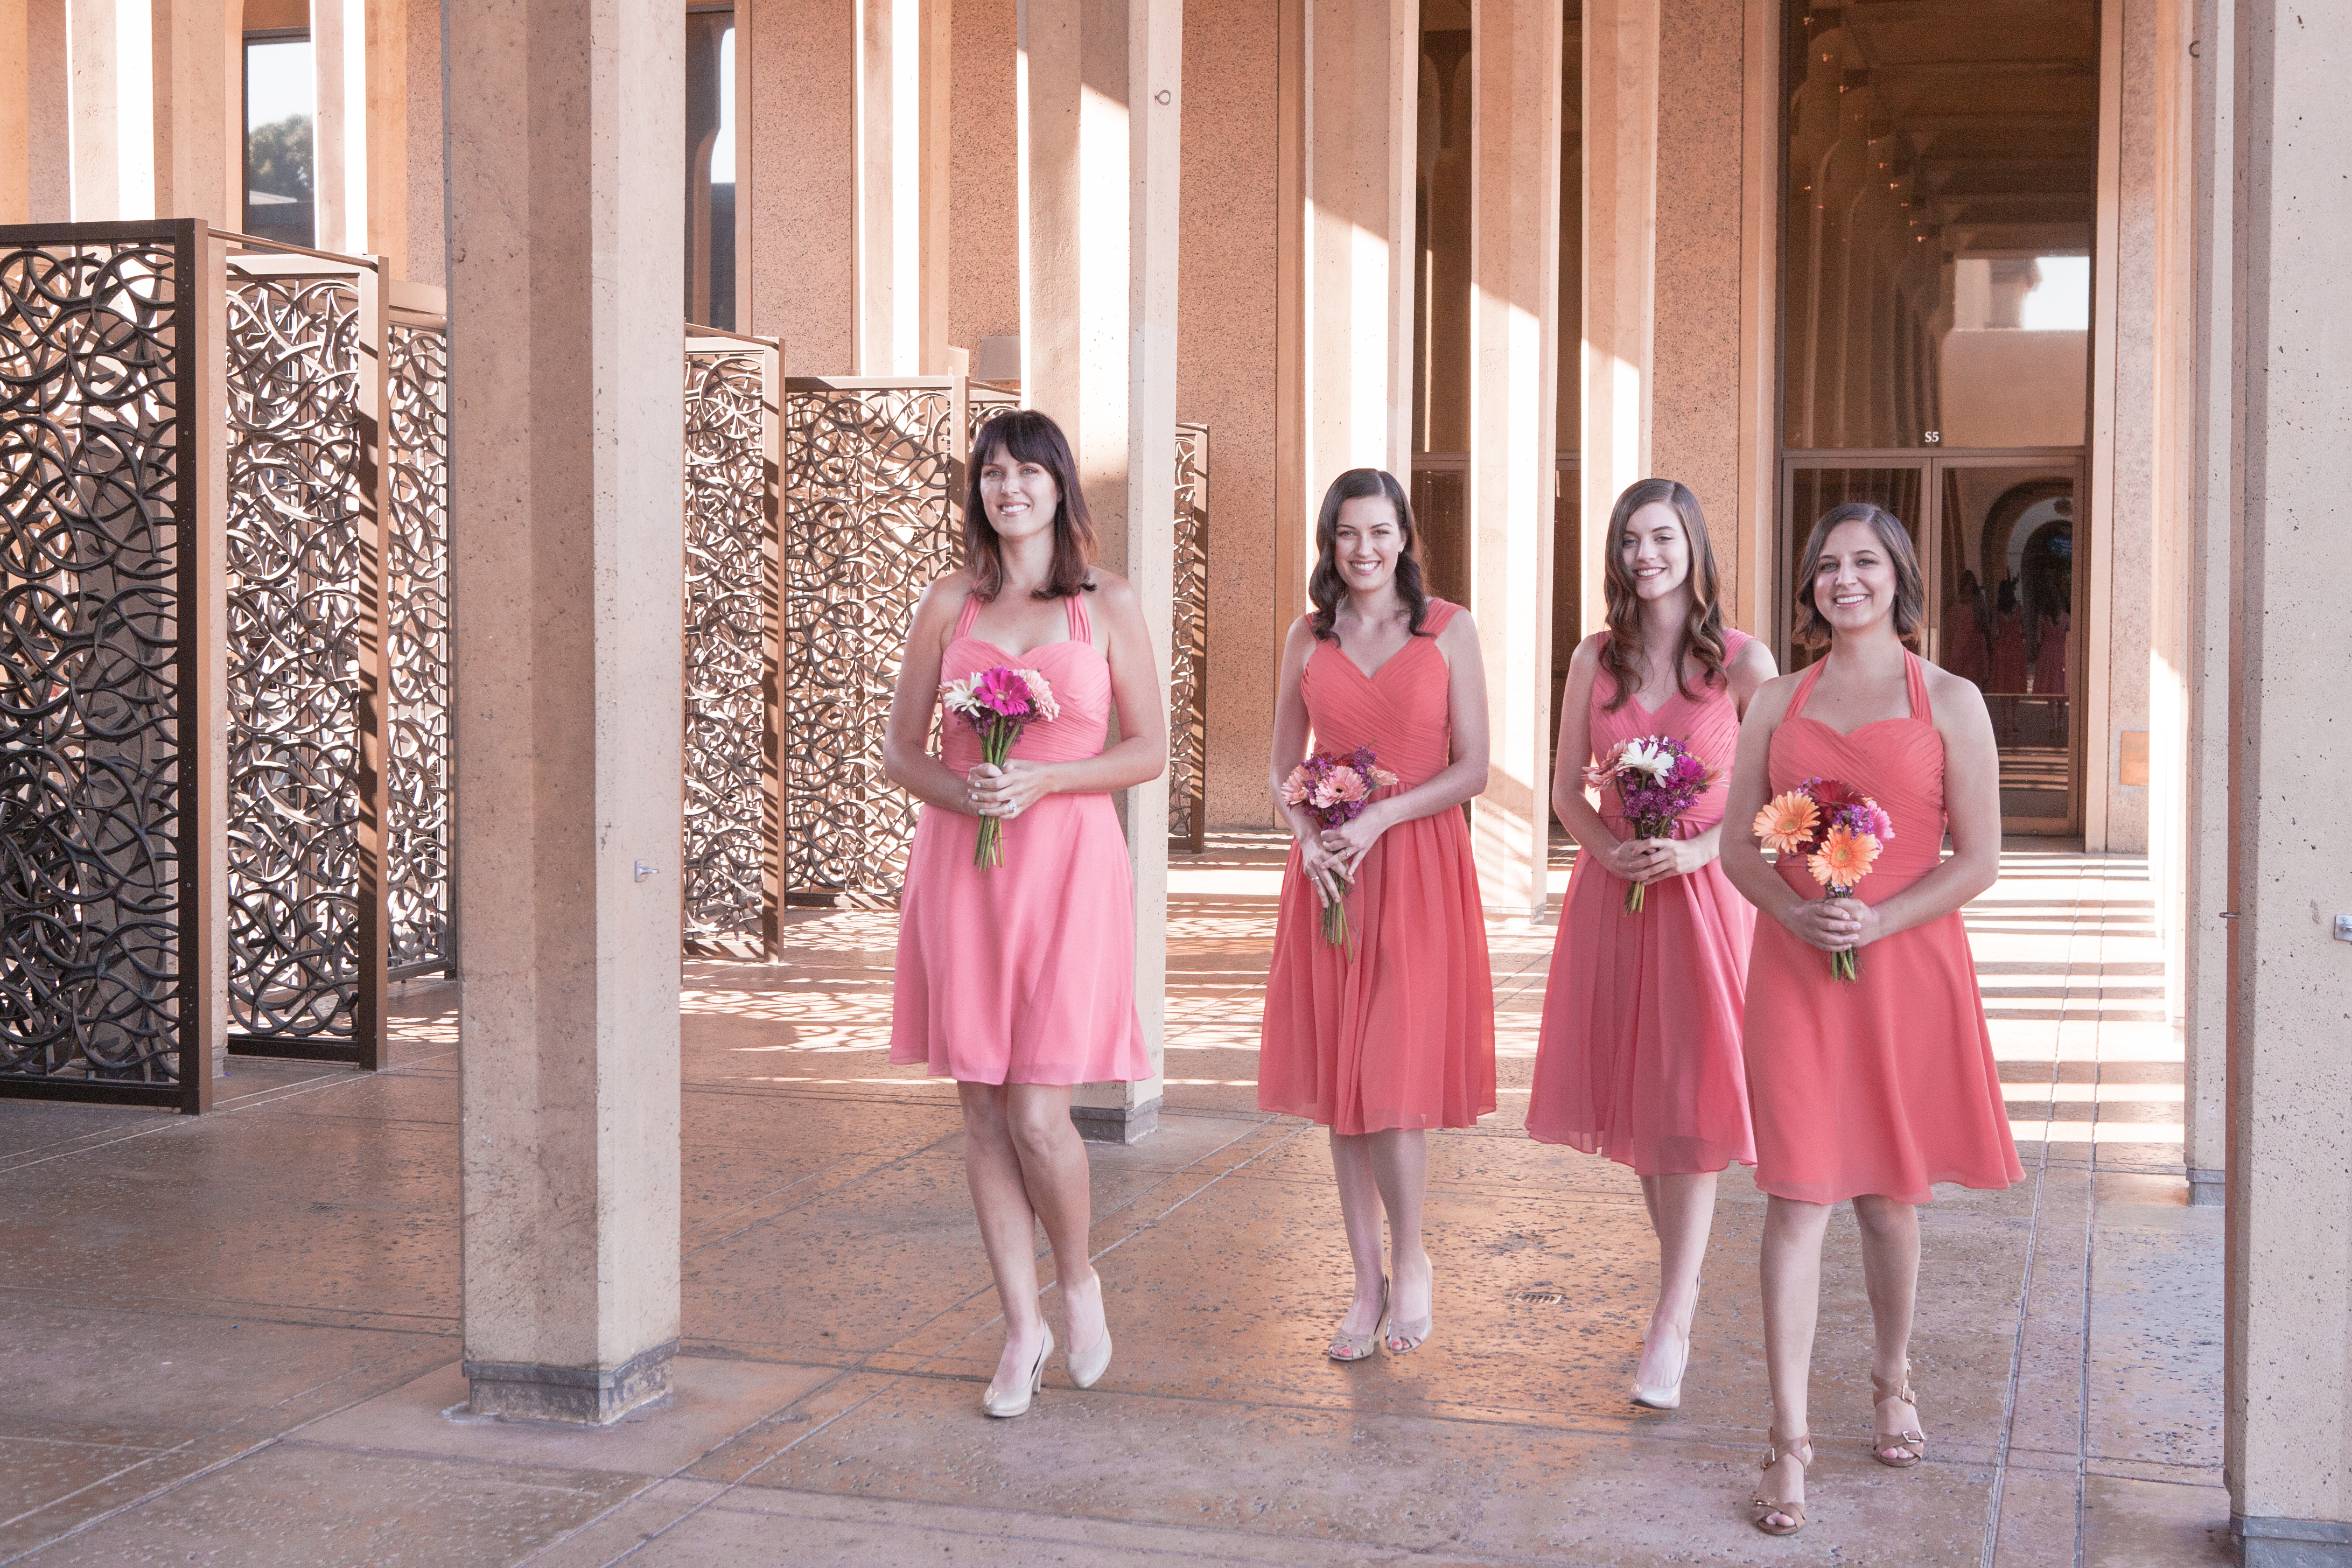 Azazie Bridesmaids Balboa Park